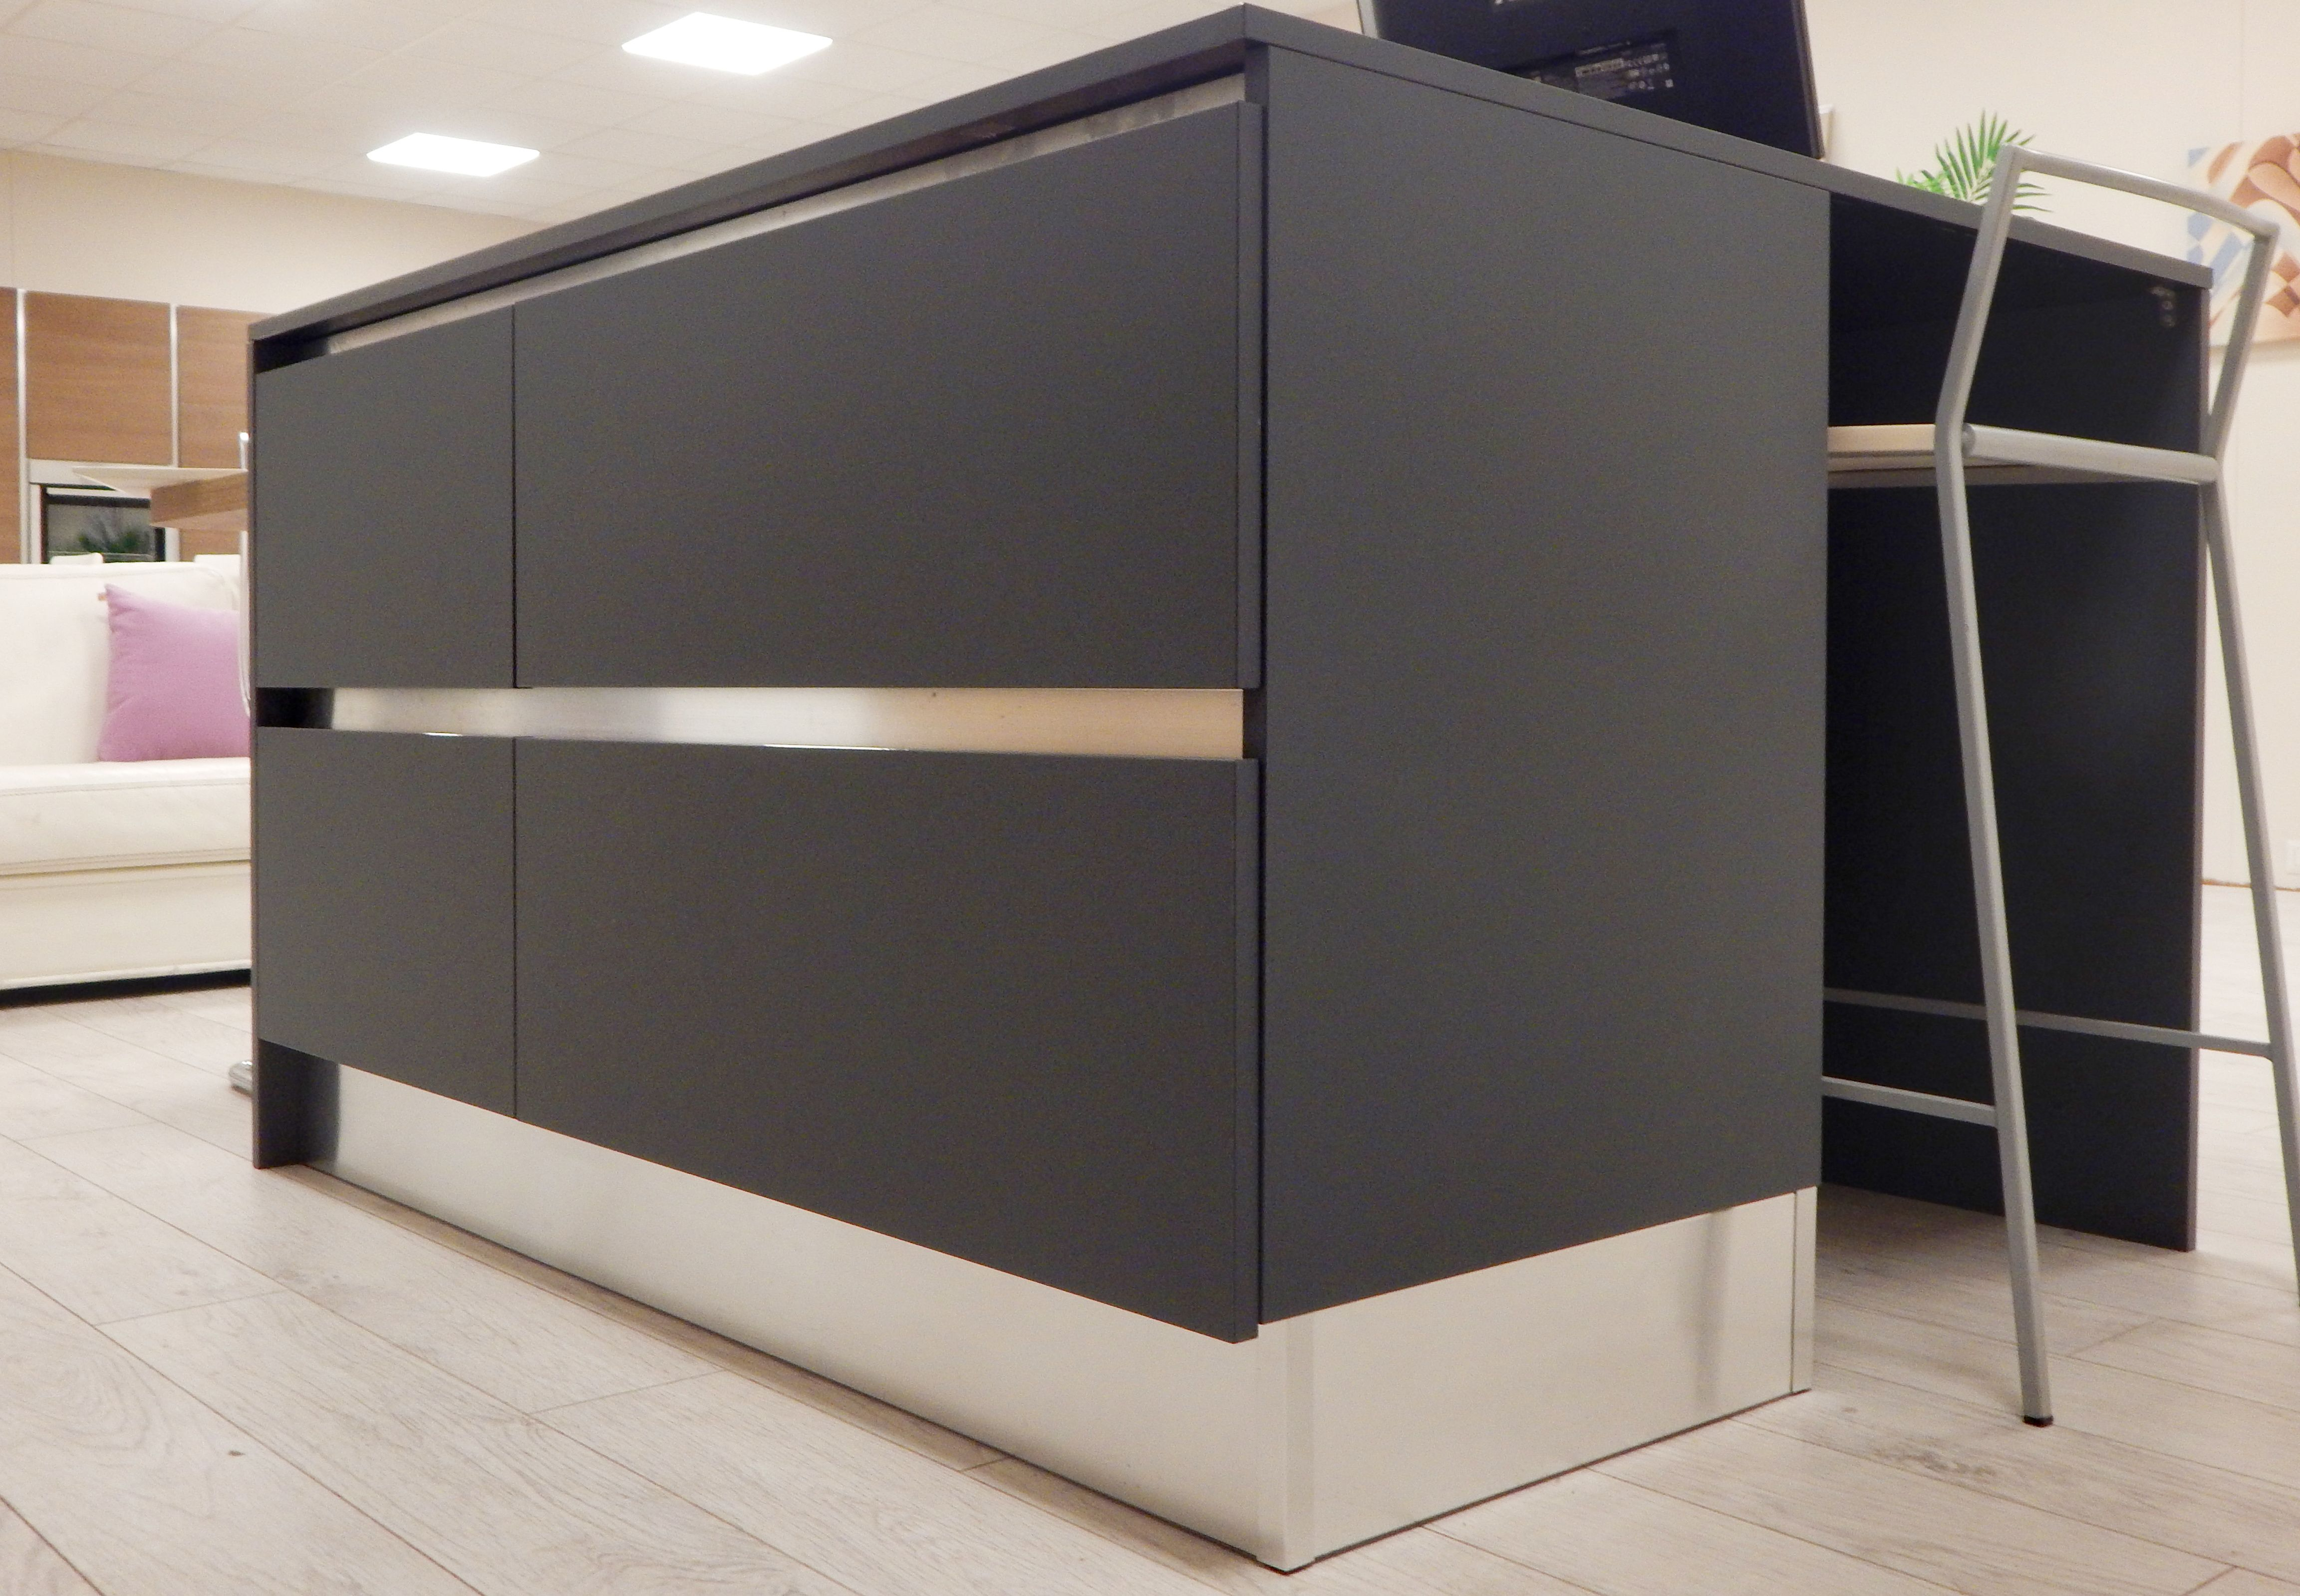 interior design, arredamento, fenix, top, ante, rinnovo ...